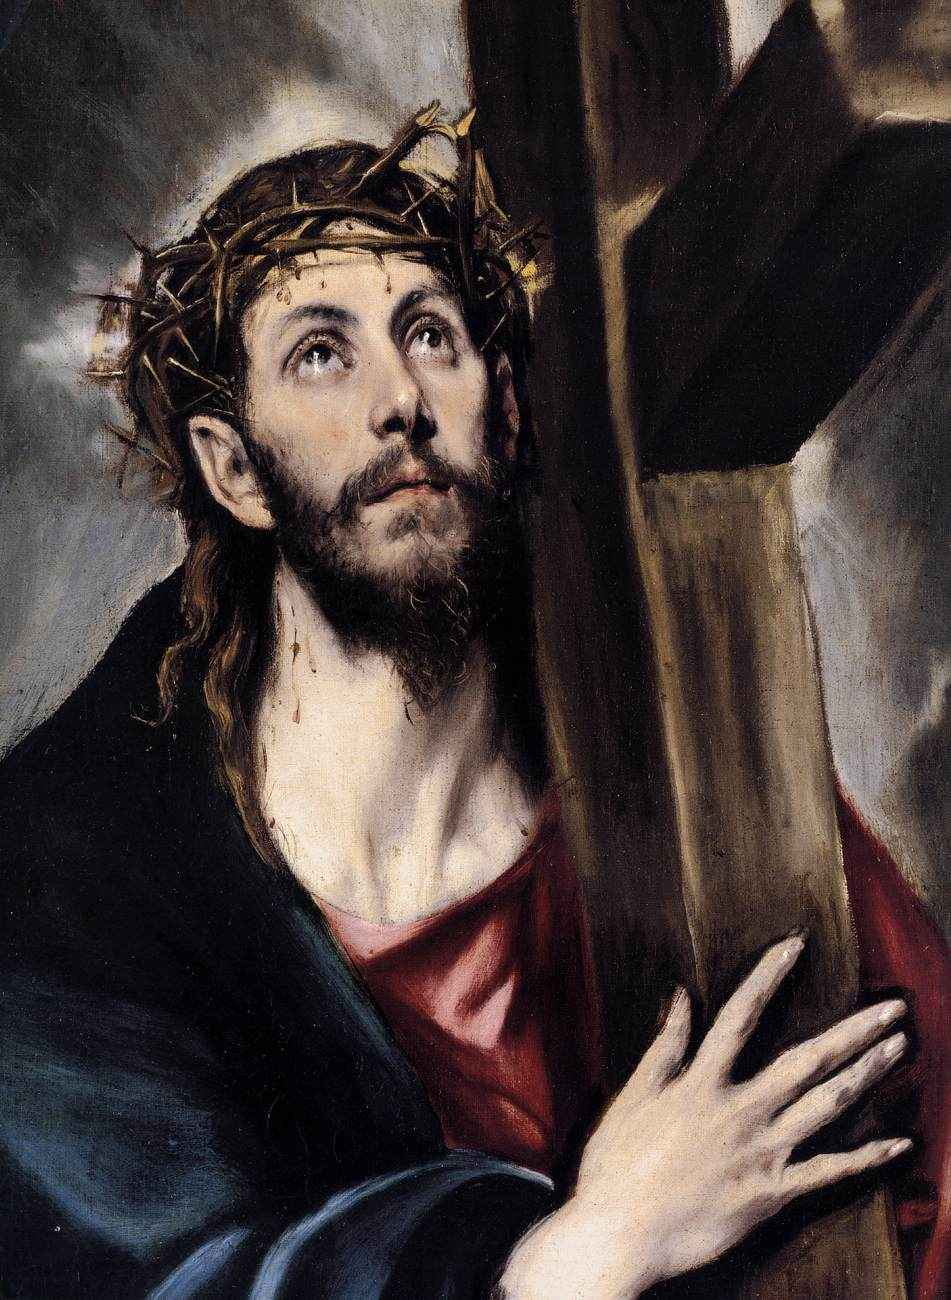 http://3.bp.blogspot.com/_Y4ckTOUw-kA/S7CZZQnHzbI/AAAAAAAAAeY/FHwnVkIiz6s/s1600/11657-christ-carrying-the-cross-el-greco.jpg